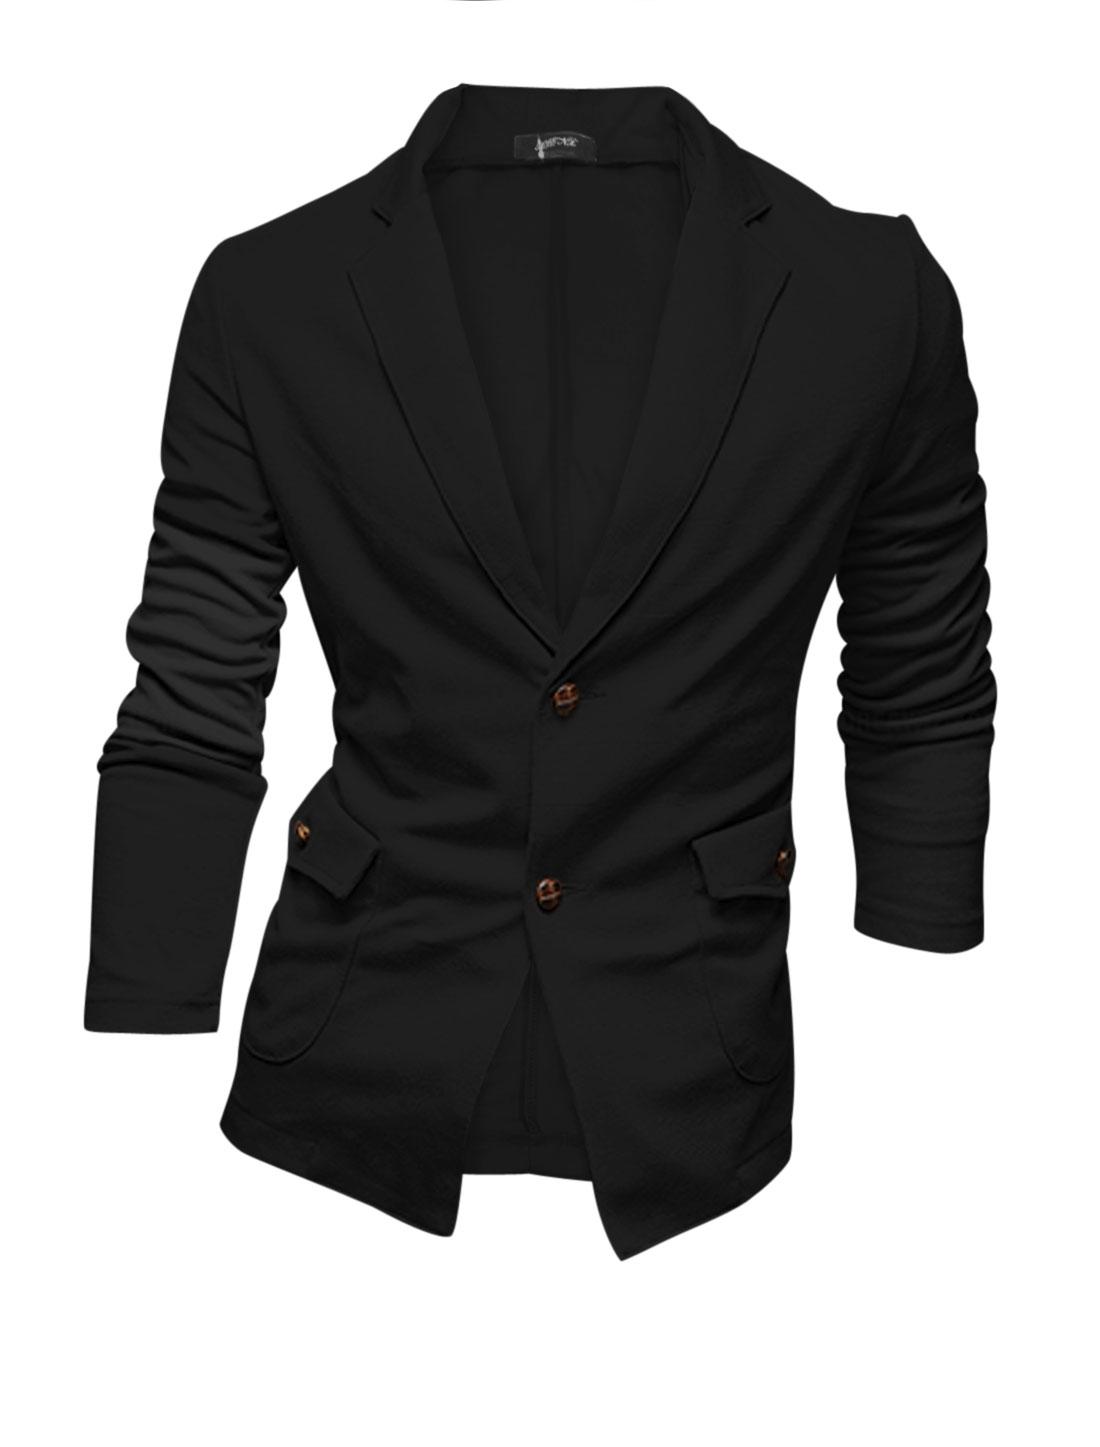 Men Black Notch Lapel Button Closure Two Pockets Long Sleeve Casual Blazer M